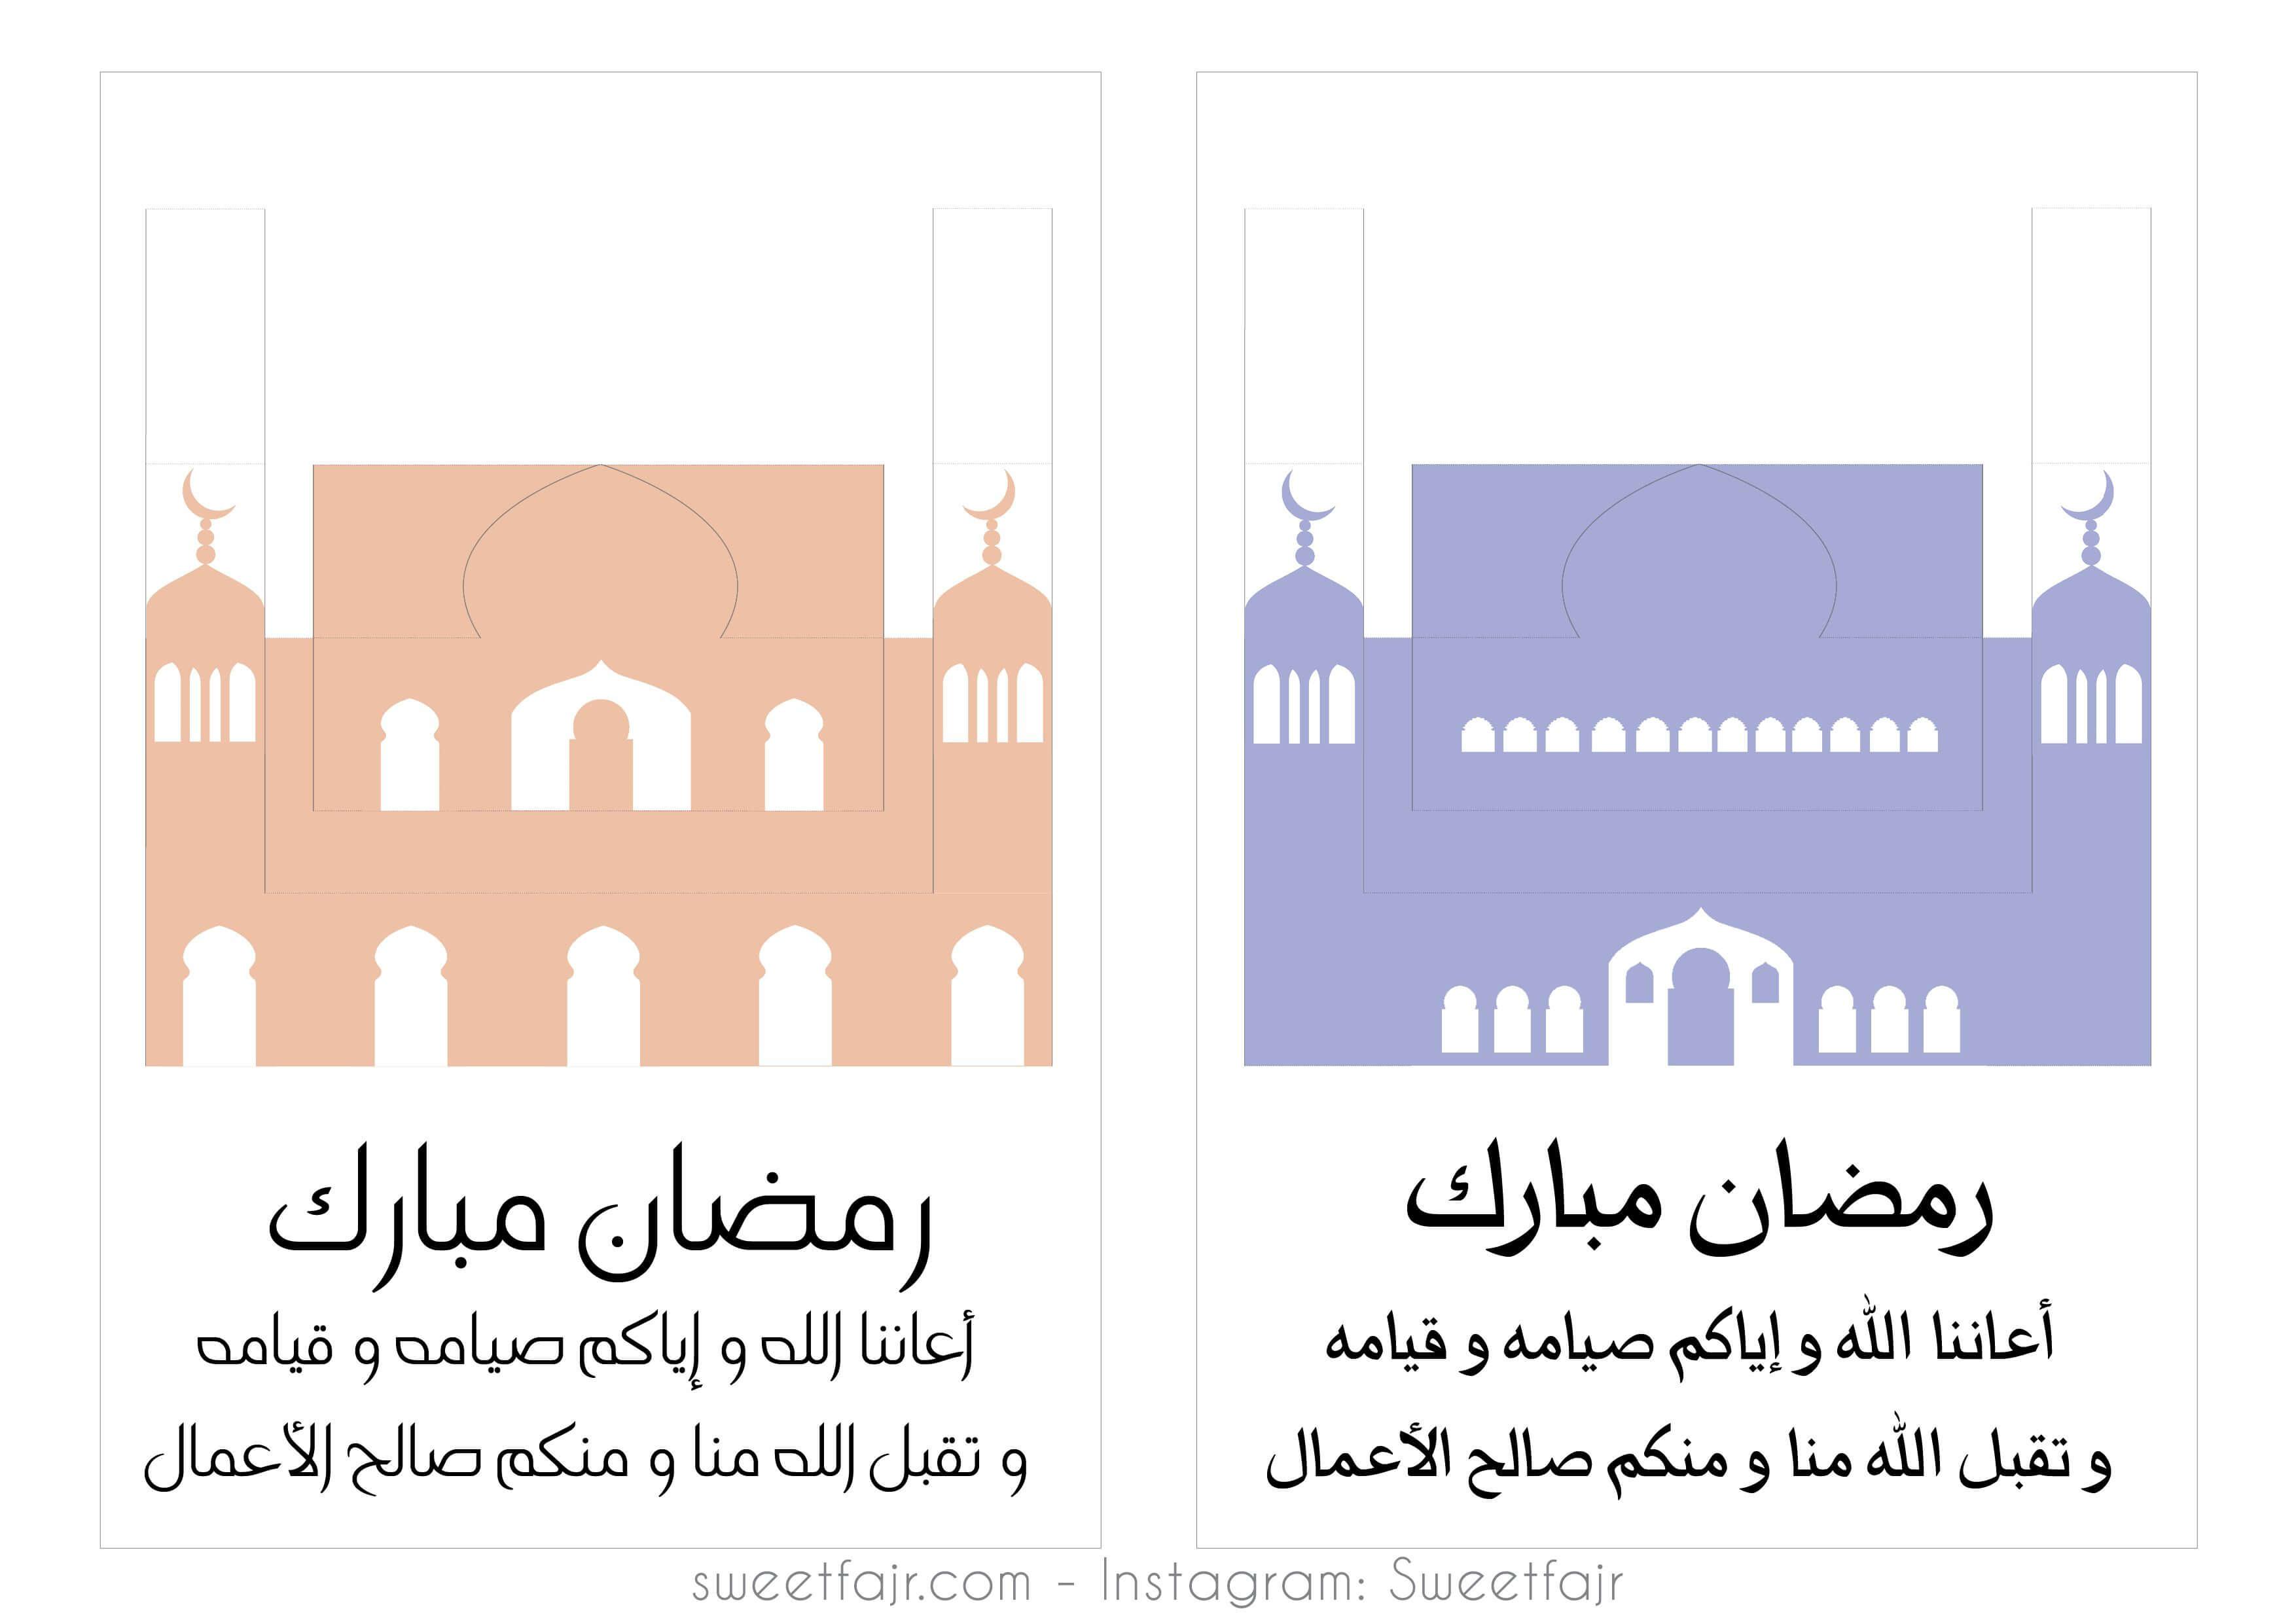 Pop Up Card Templates For Ramadan | Free Printable Pop-Up inside Printable Pop Up Card Templates Free